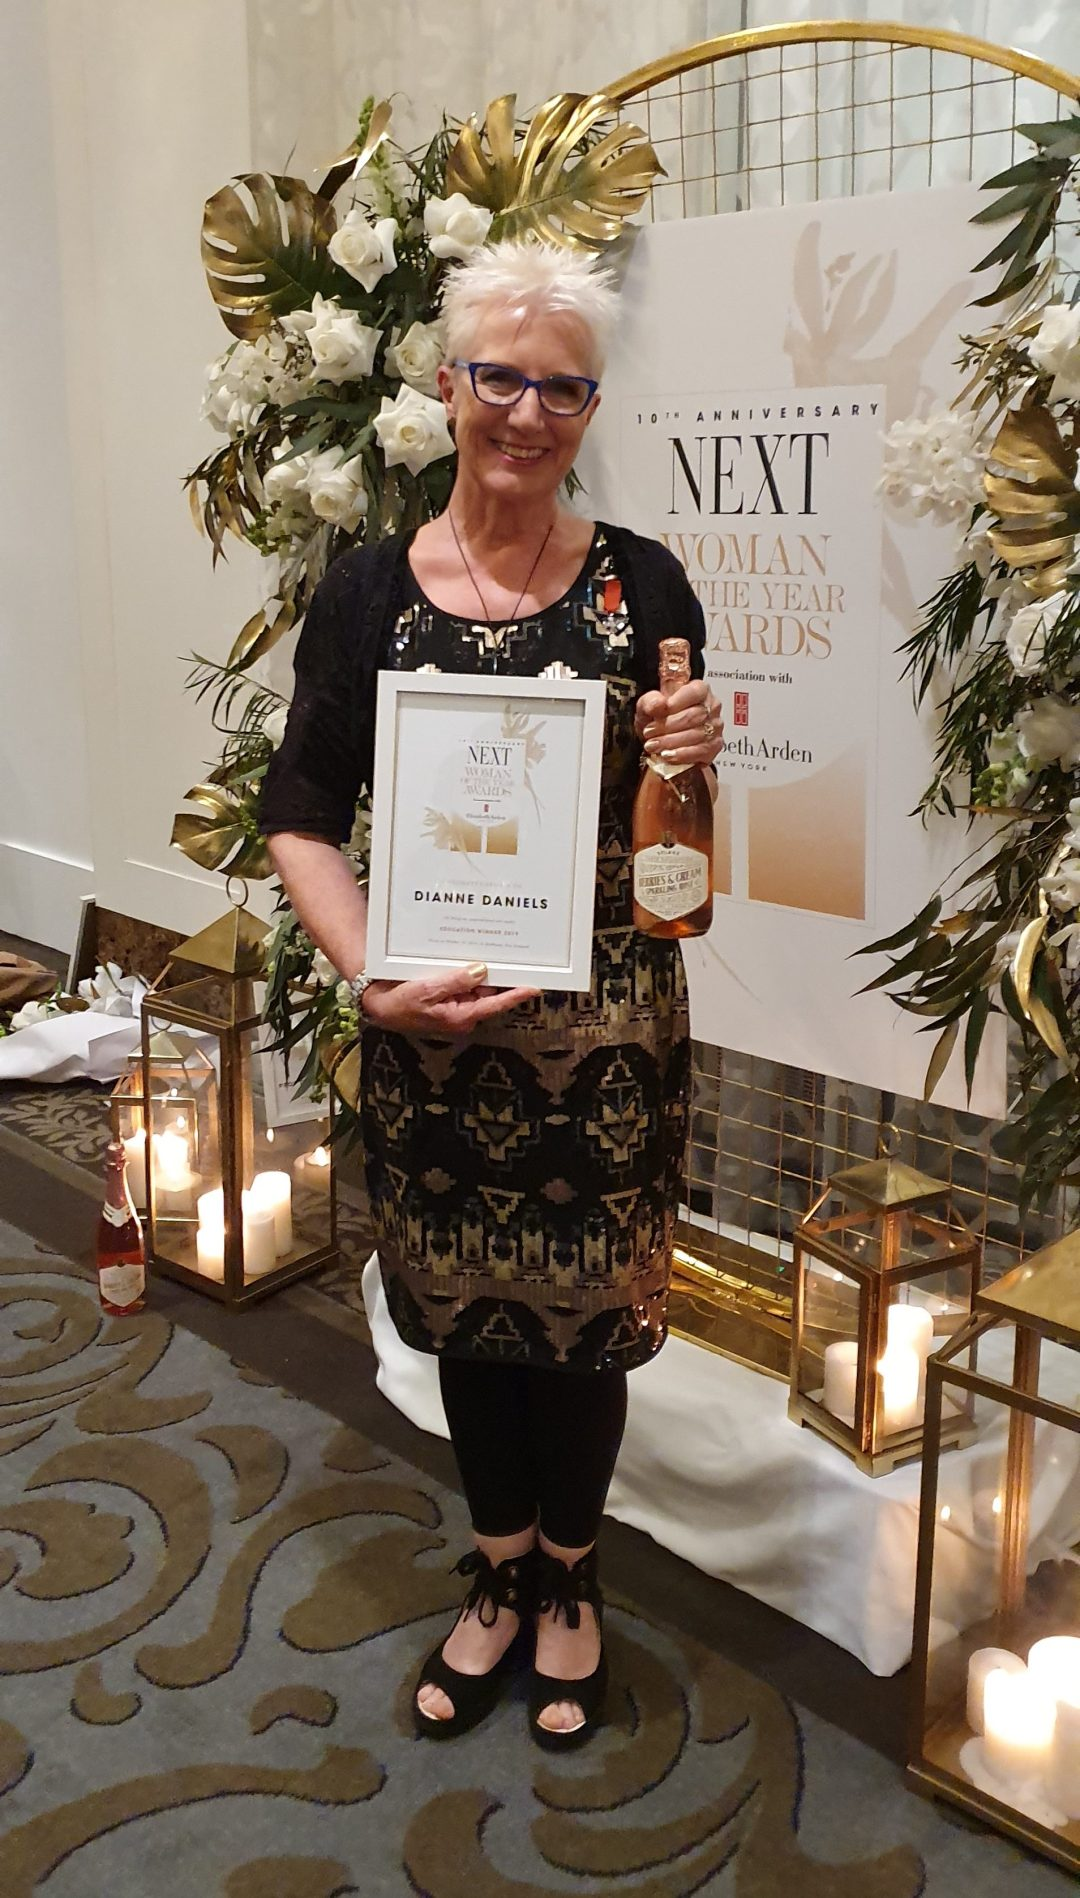 Di Daniels: Winner, education category, NEXT Woman of the Year Awards